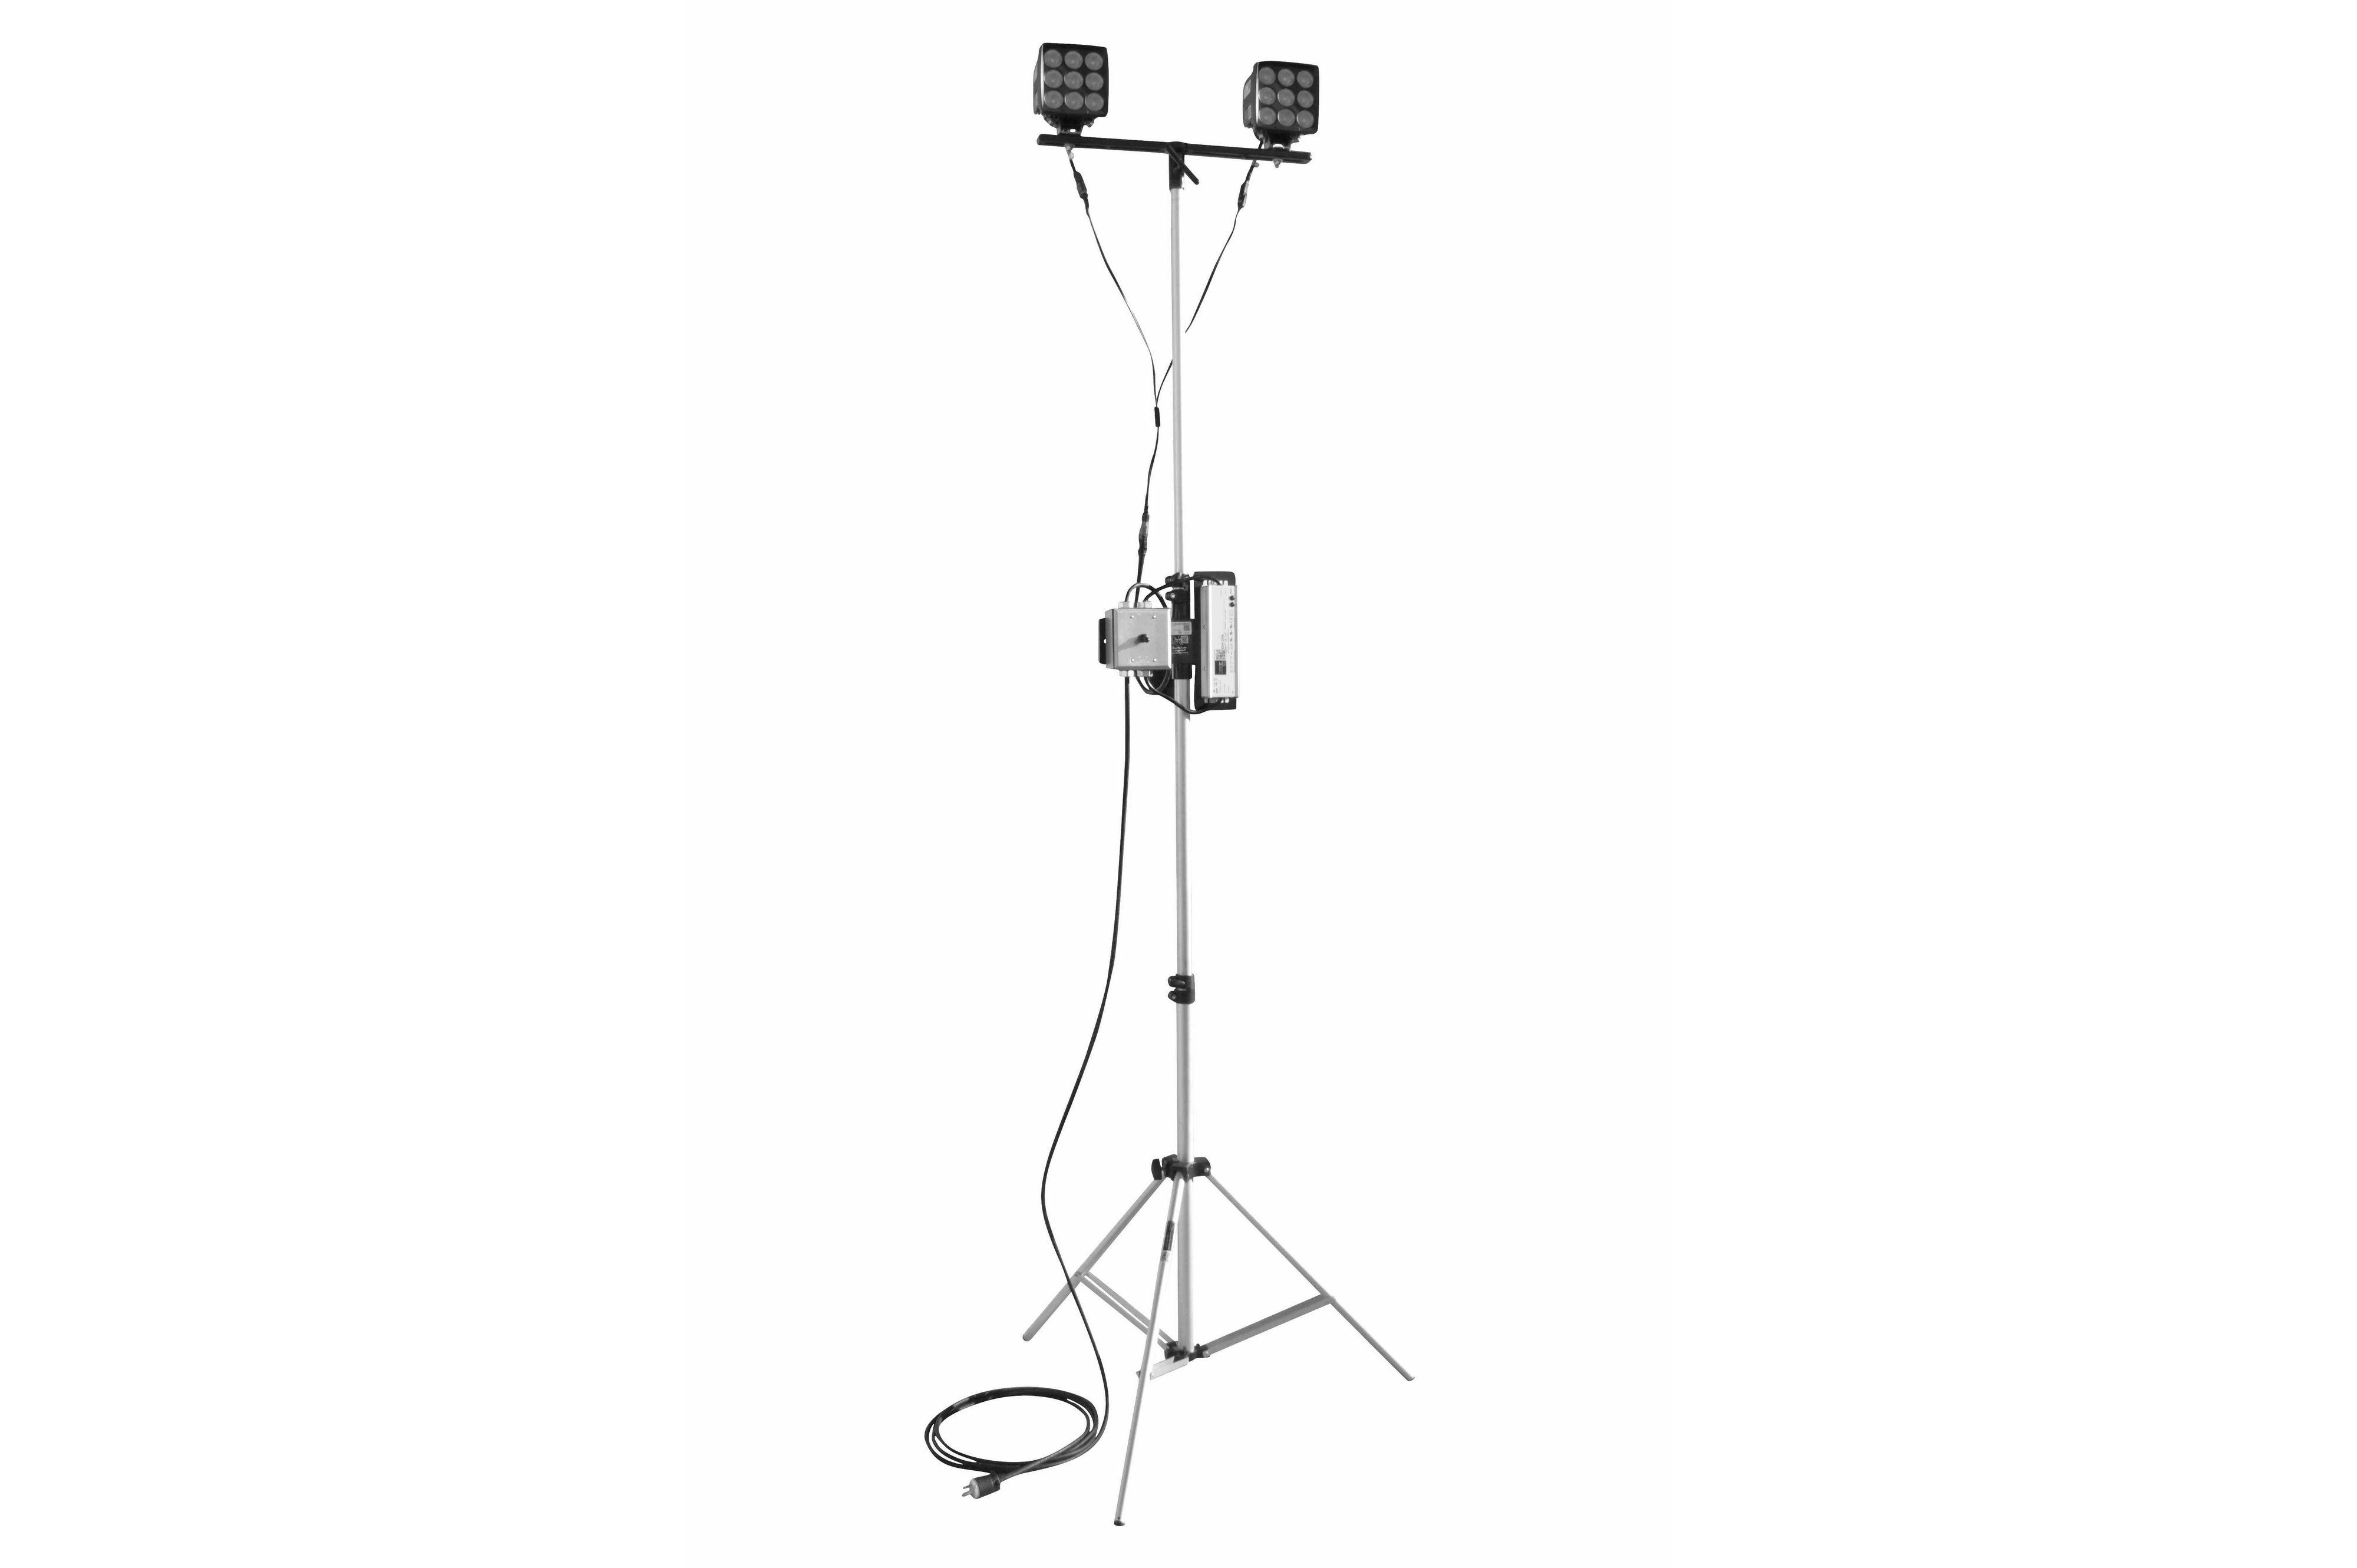 180 Watt Dual Led Light On Telescoping Tripod